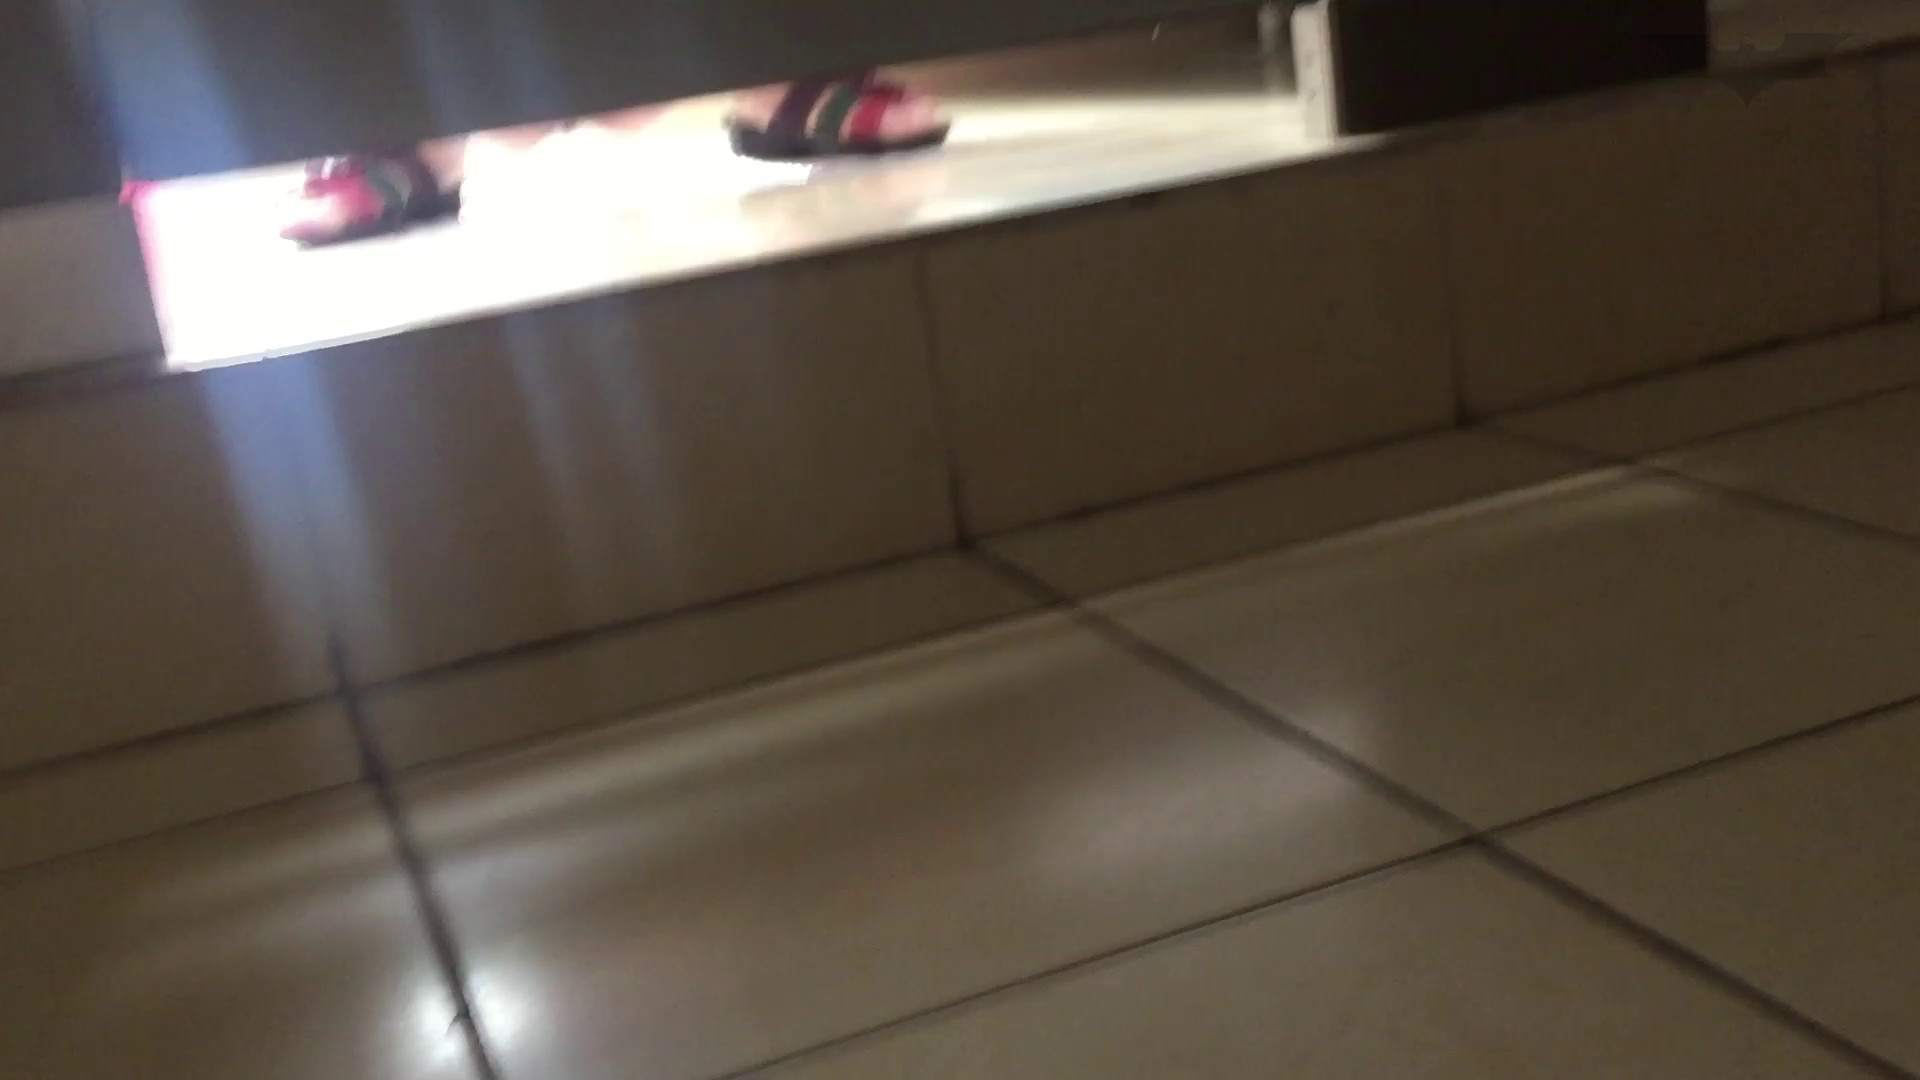 JD盗撮 美女の洗面所の秘密 Vol.74 OLの実態 盗撮ワレメ無修正動画無料 91pic 82